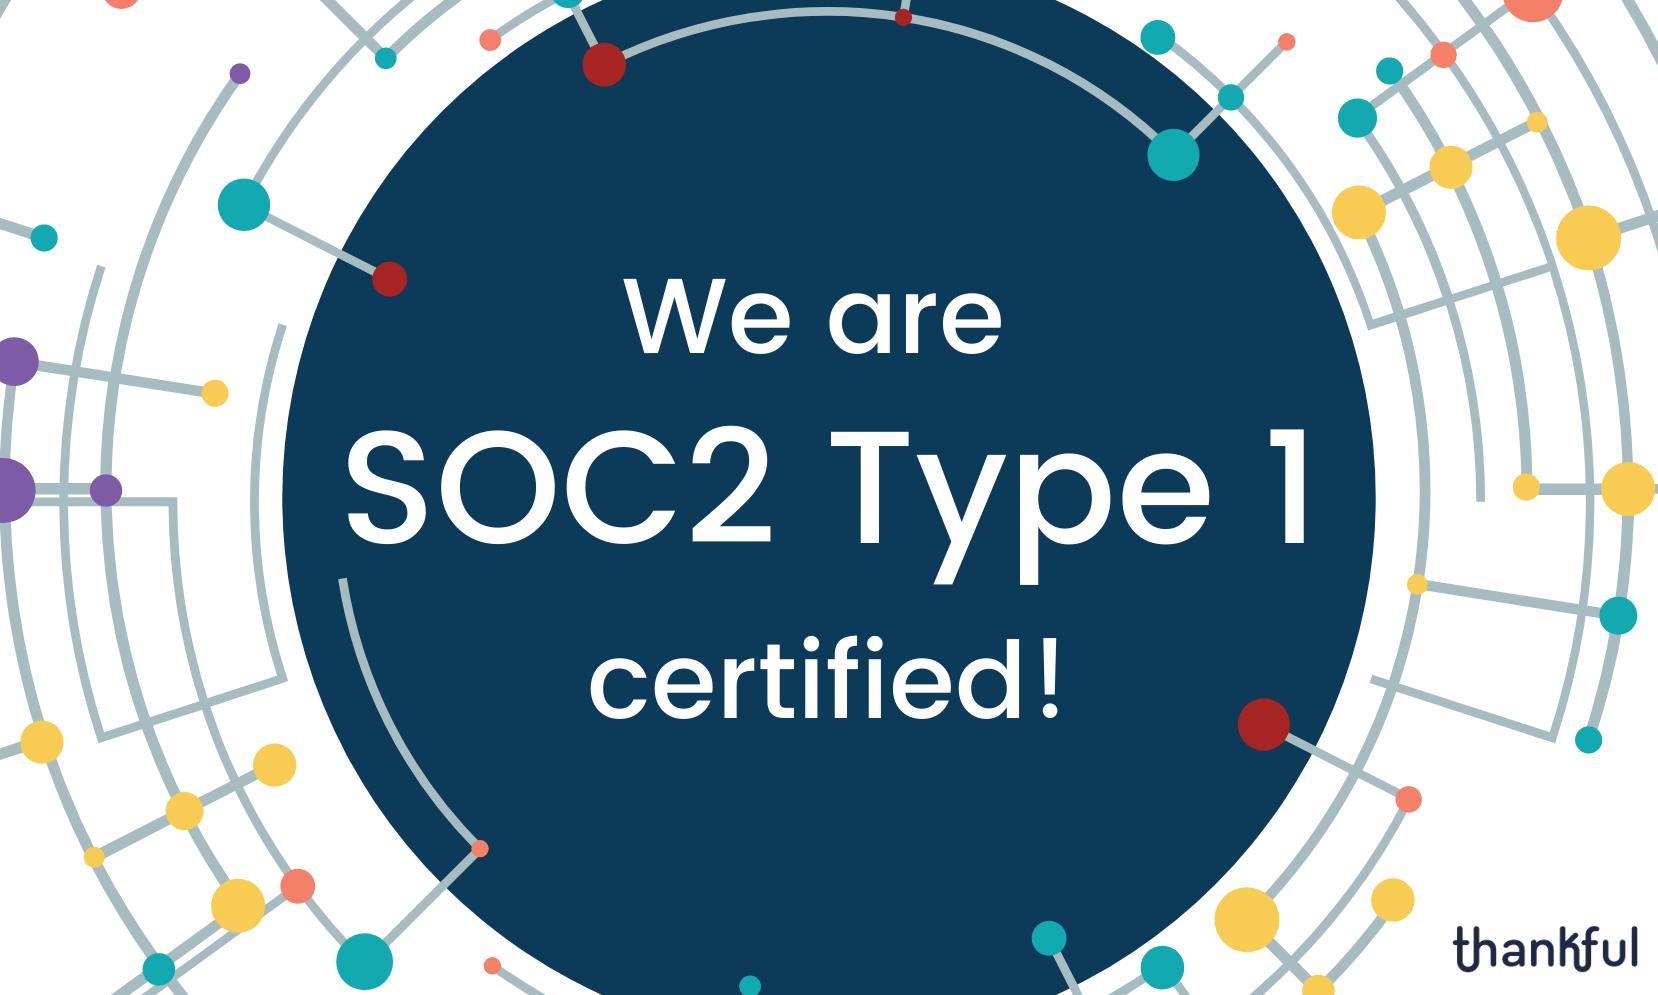 SOC2 Type 1 Blog Post Graphic